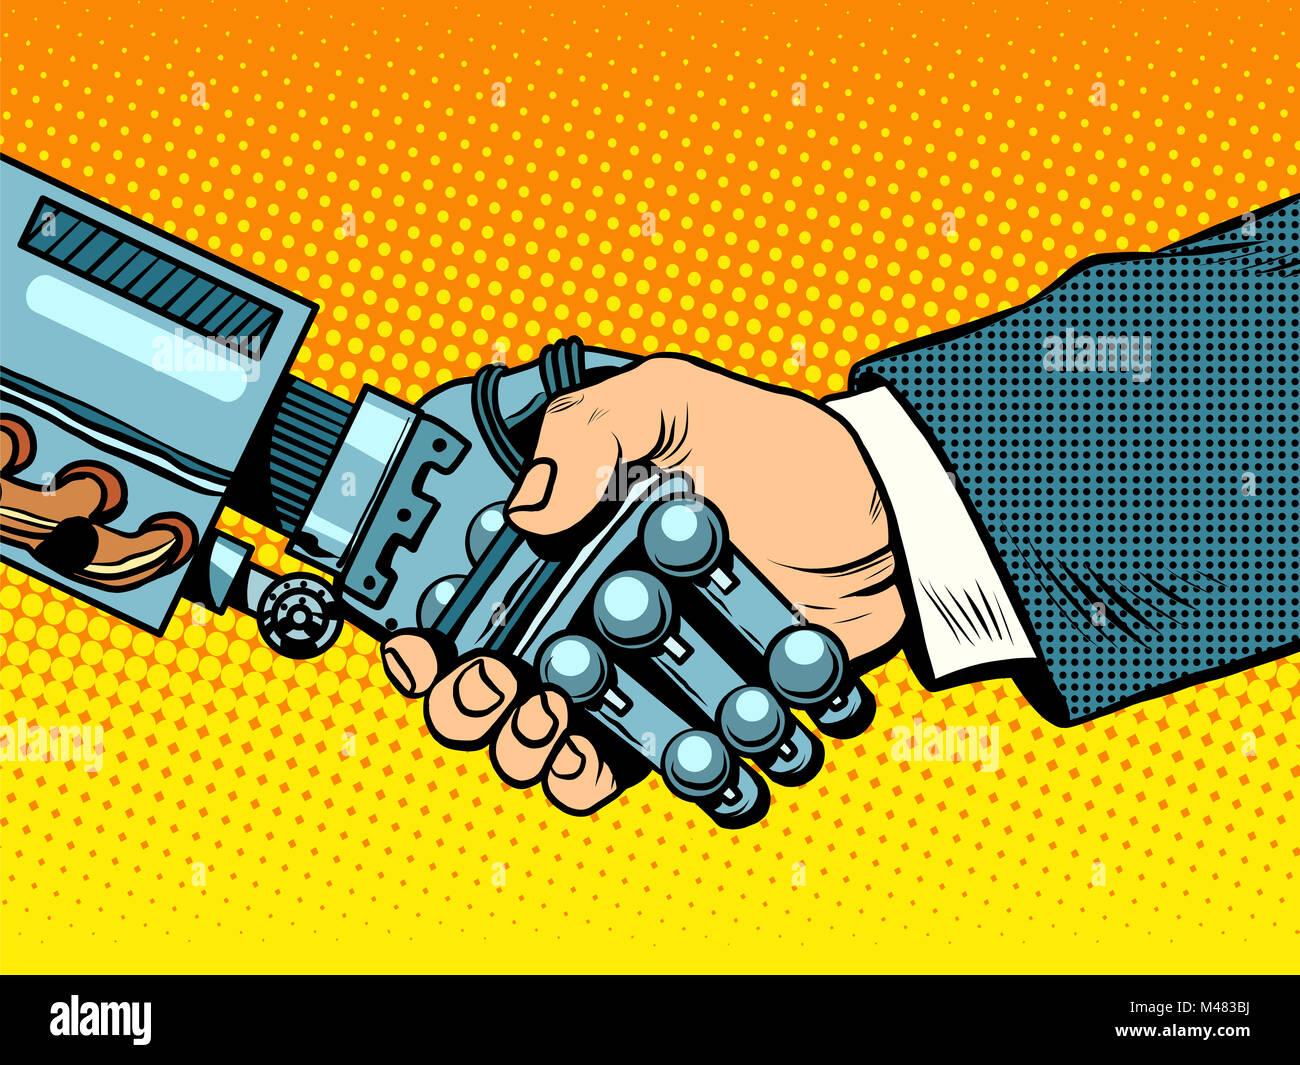 Handshake of robot and man. New technologies evolution - Stock Image